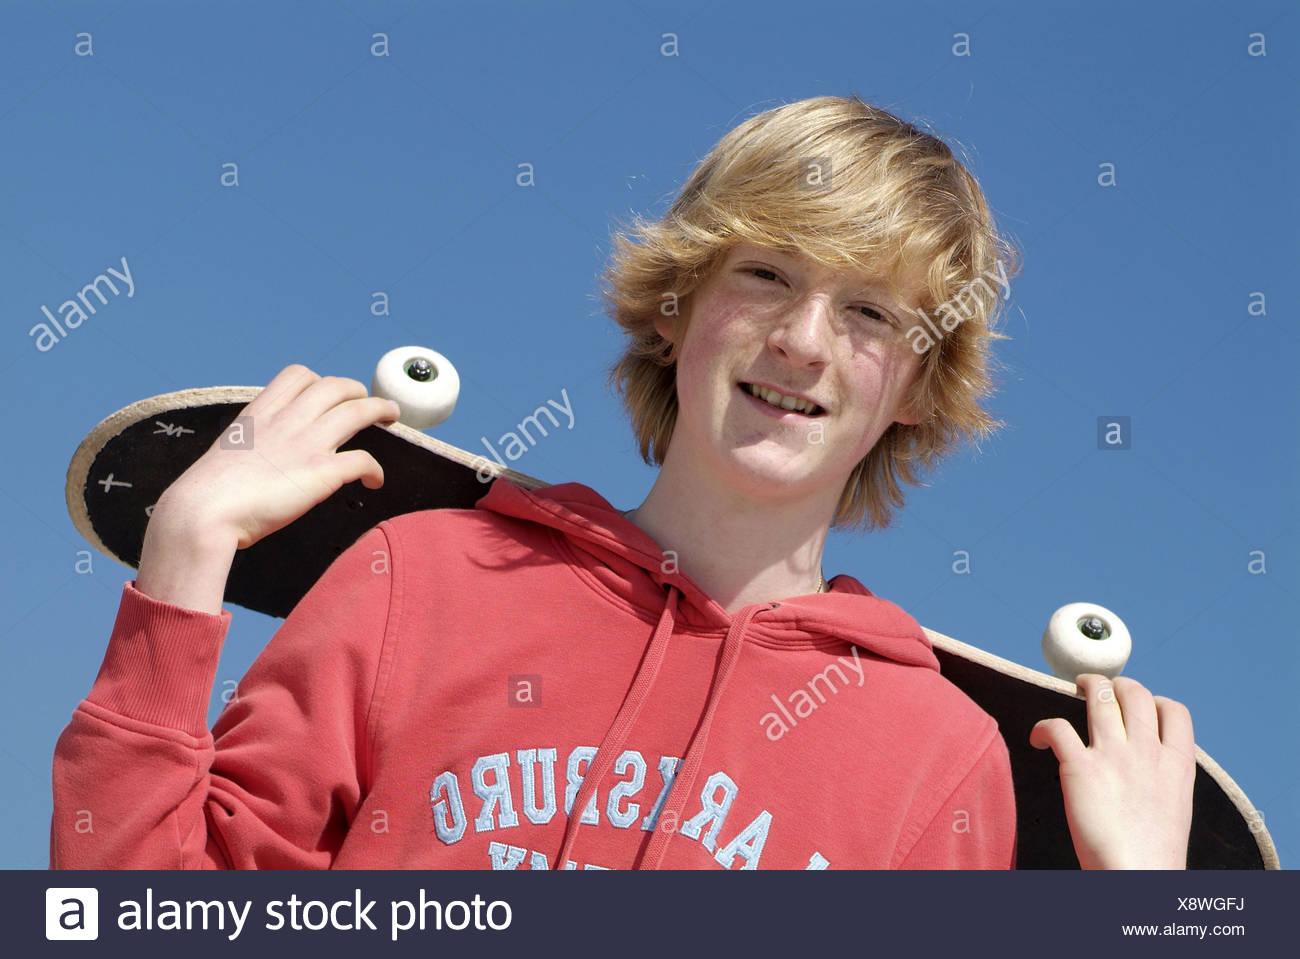 Adolescente,la cultura juvenil,skateboard Imagen De Stock